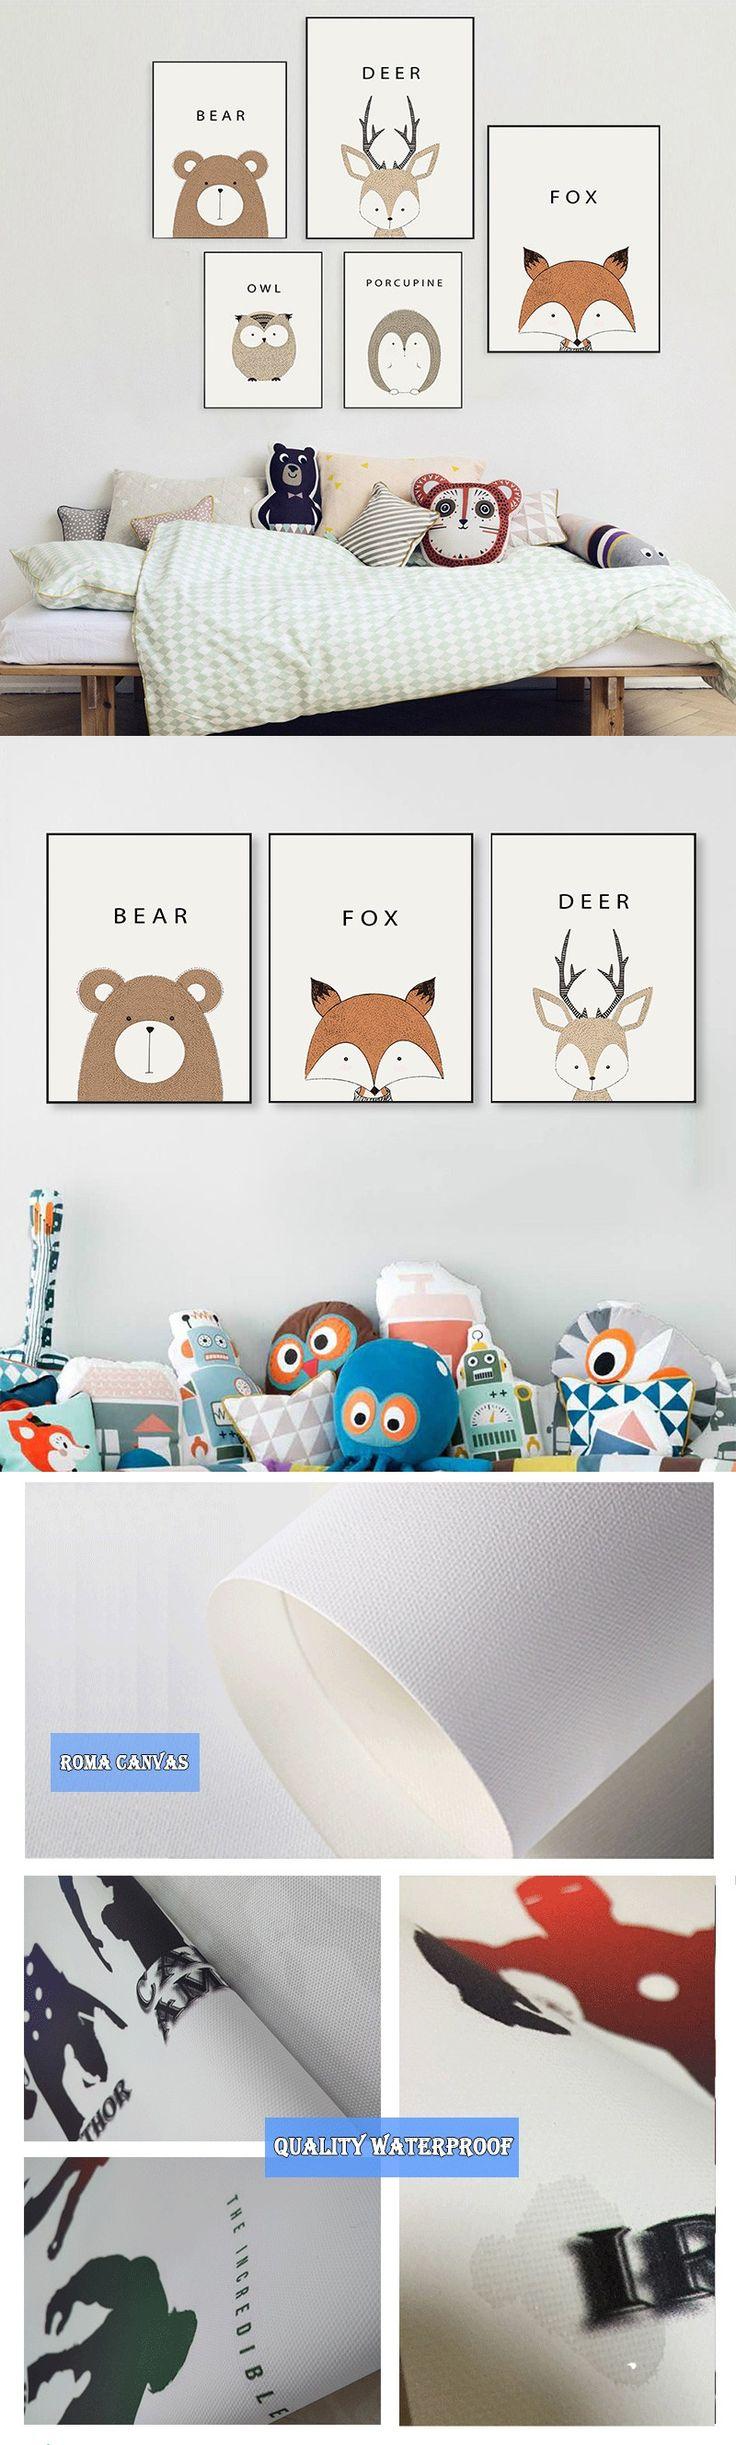 Cute Cartoon Animal Minimalist Art Canvas Poster Print Deer Bear Modern Nursery Picture for Modern Home Kids Room Decor 035 $6.59